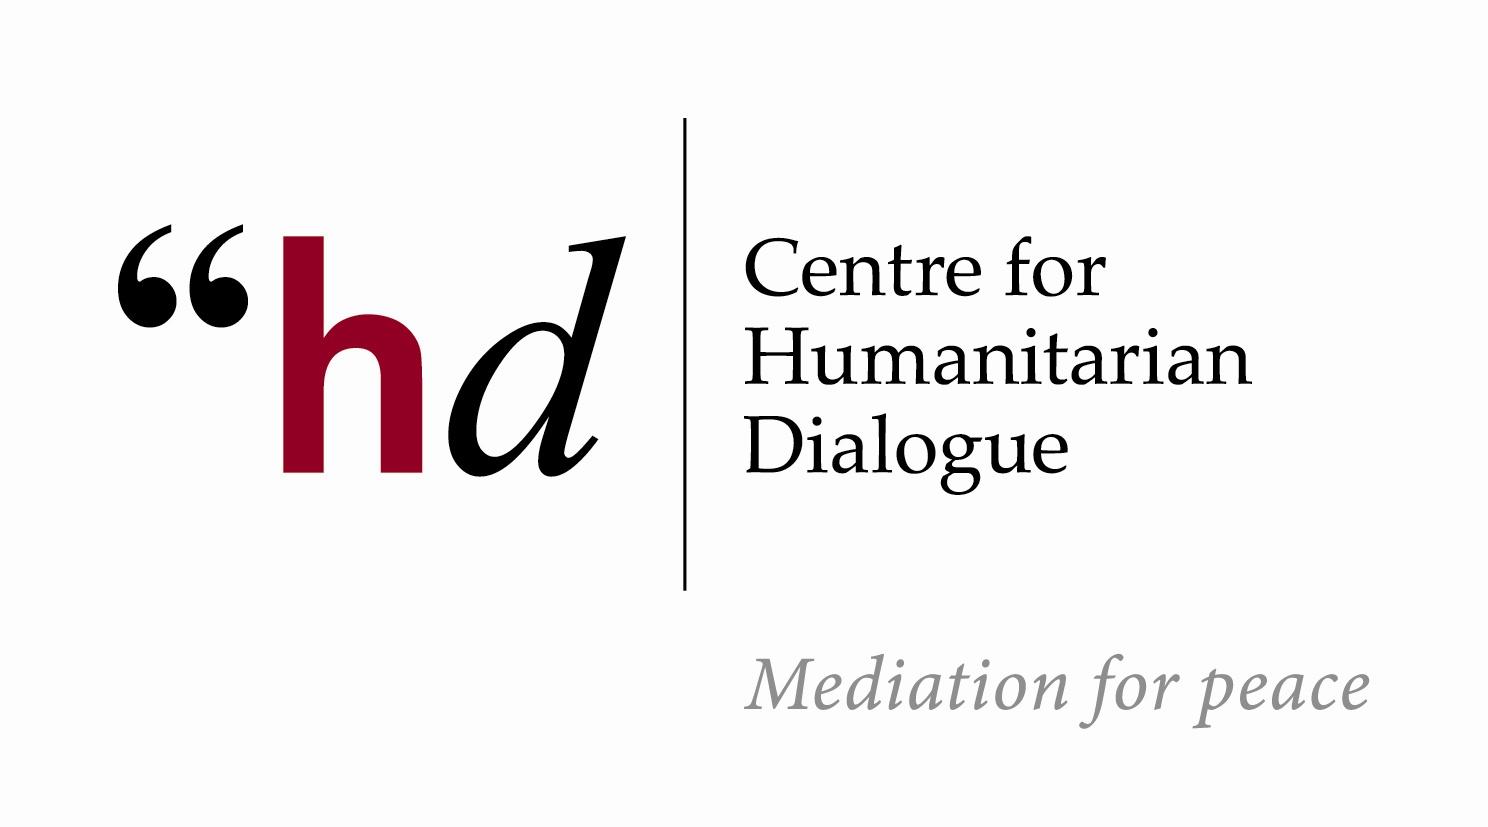 Centre for Humanitarian Dialogue